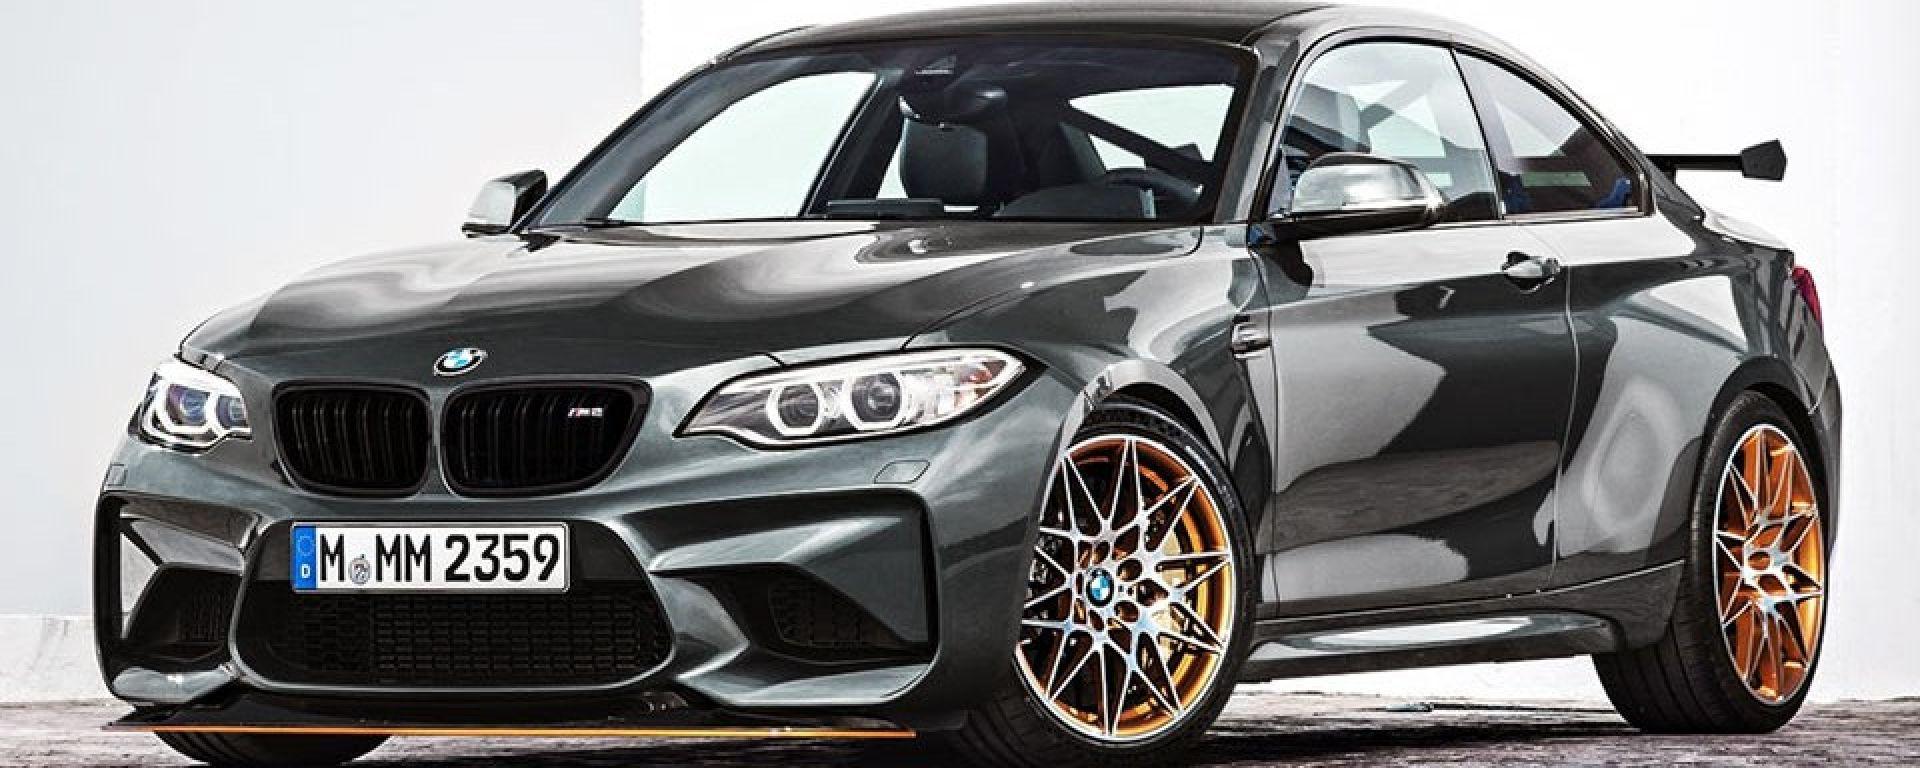 BMW M2 GTS: arriva nel 2019 con 450 CV, dopo la BMW M2 CS